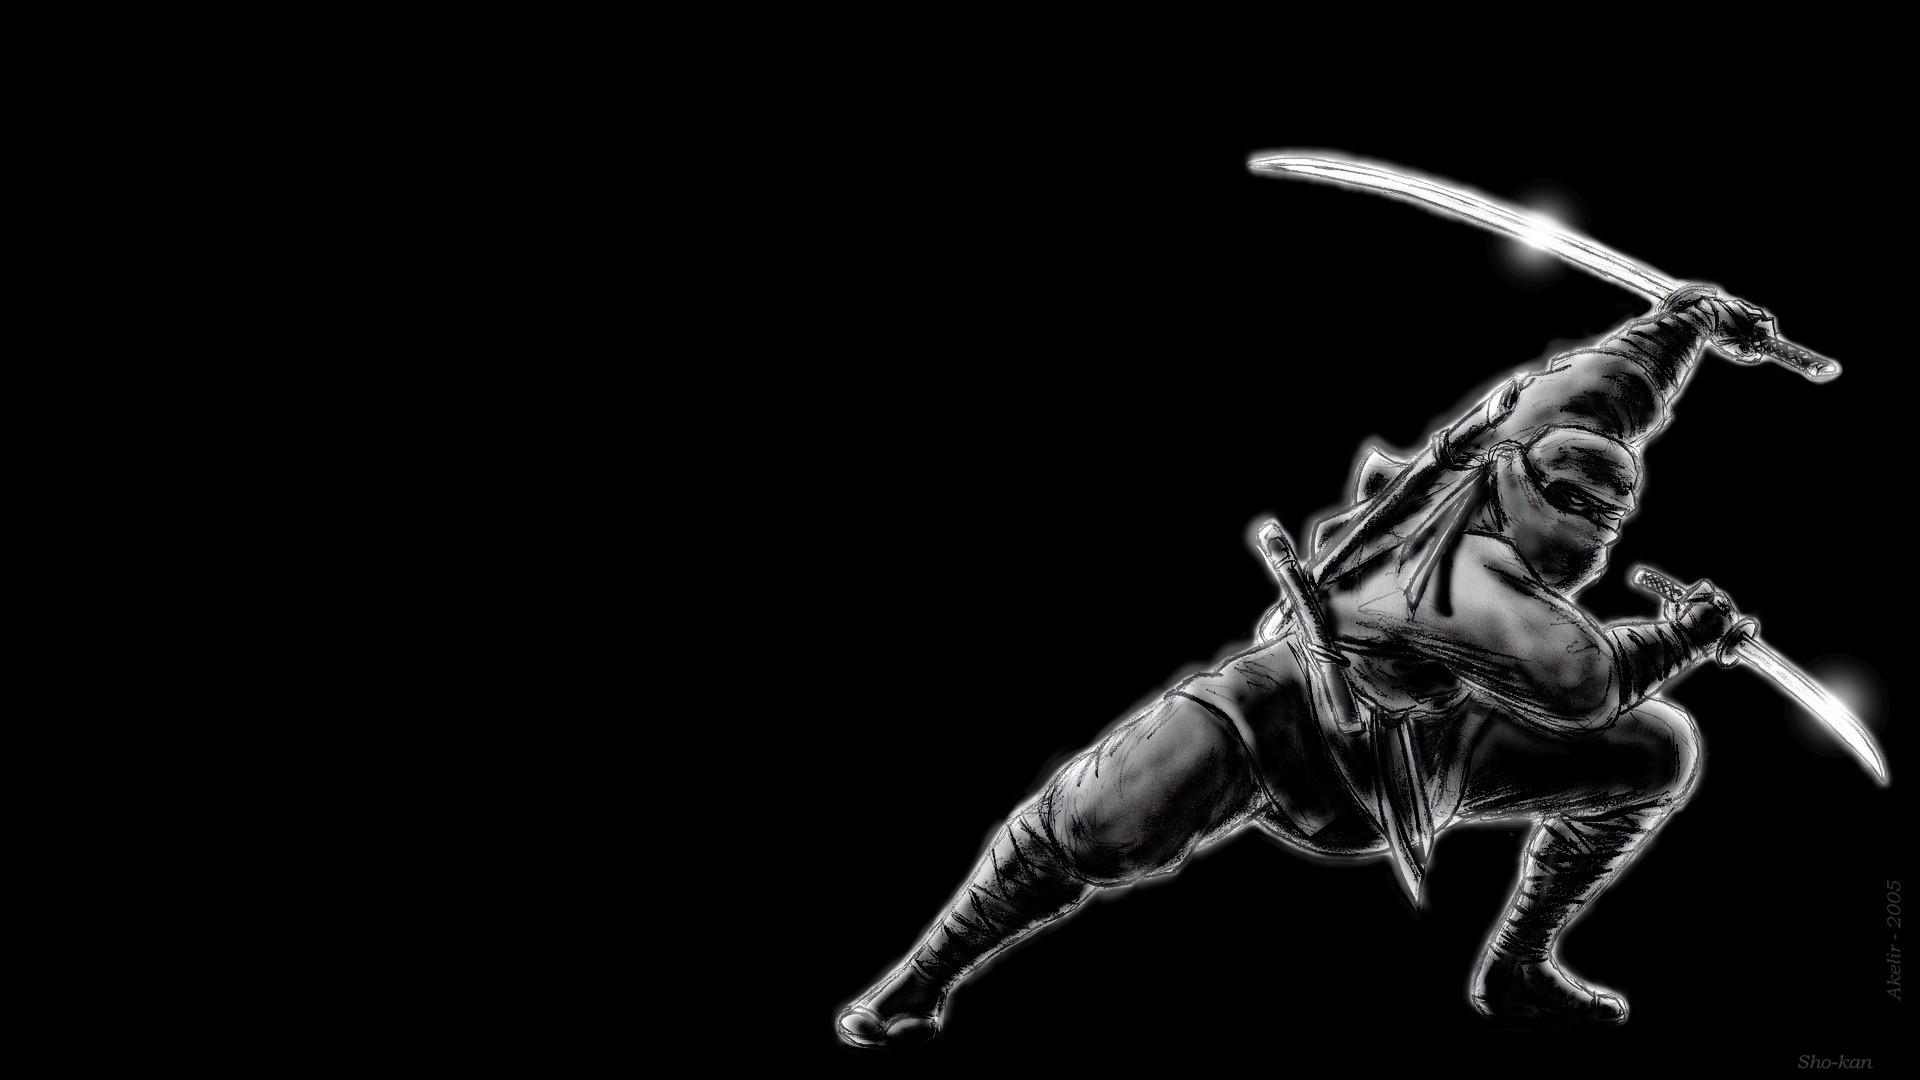 Res: 1920x1080, 6. ninja-wallpapers-HD6-600x338